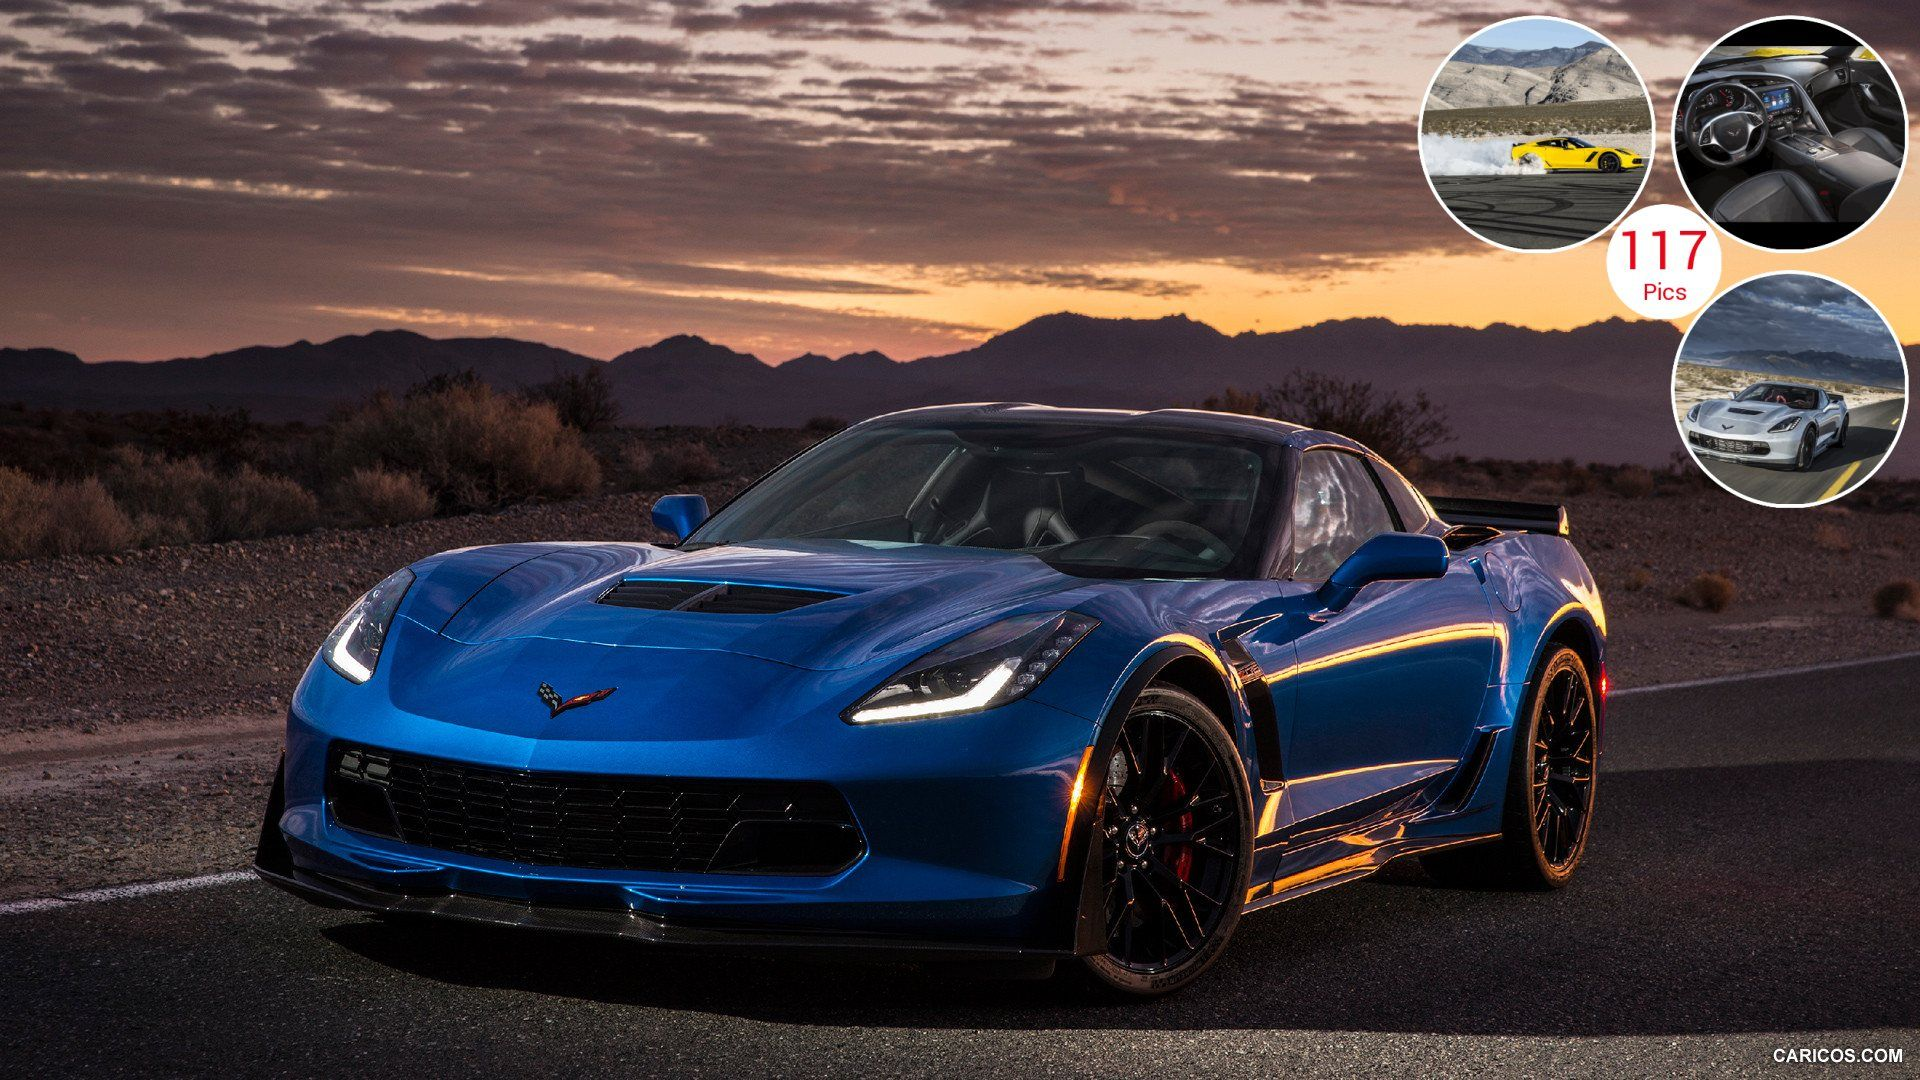 Corvette Grand Sport Iphone Wallpaper: Top Free Corvette Backgrounds